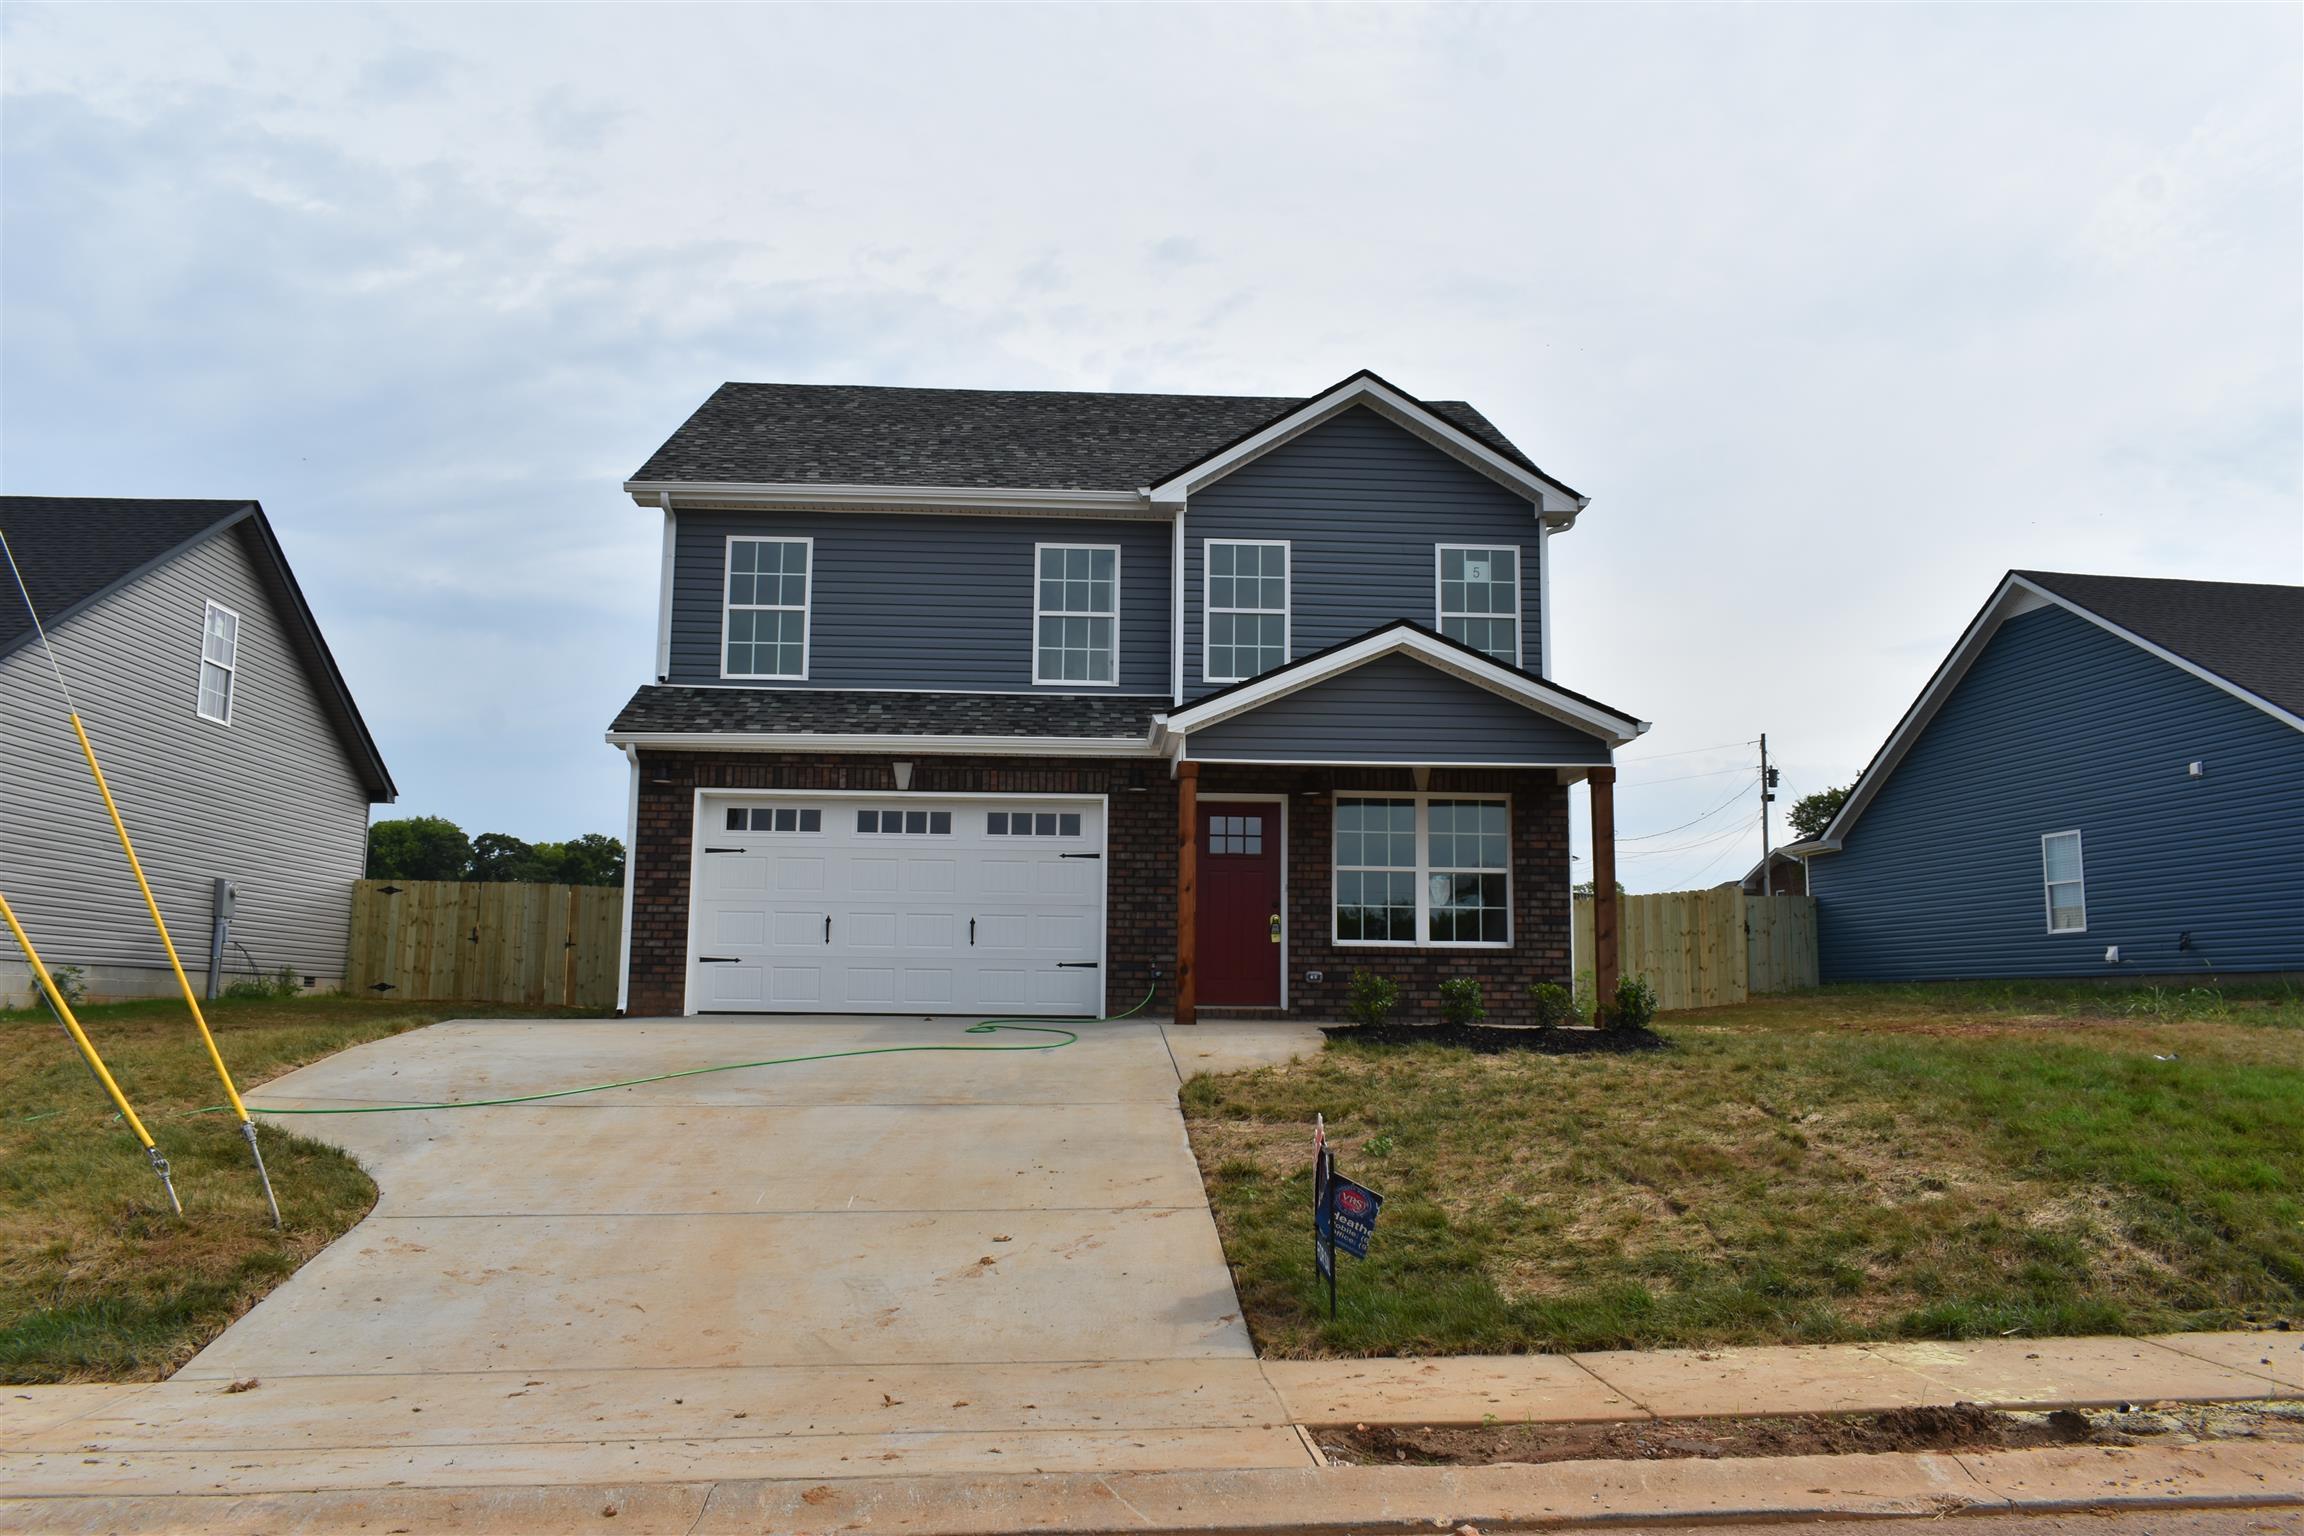 5 Rose Edd, Oak Grove, KY 42262 - Oak Grove, KY real estate listing